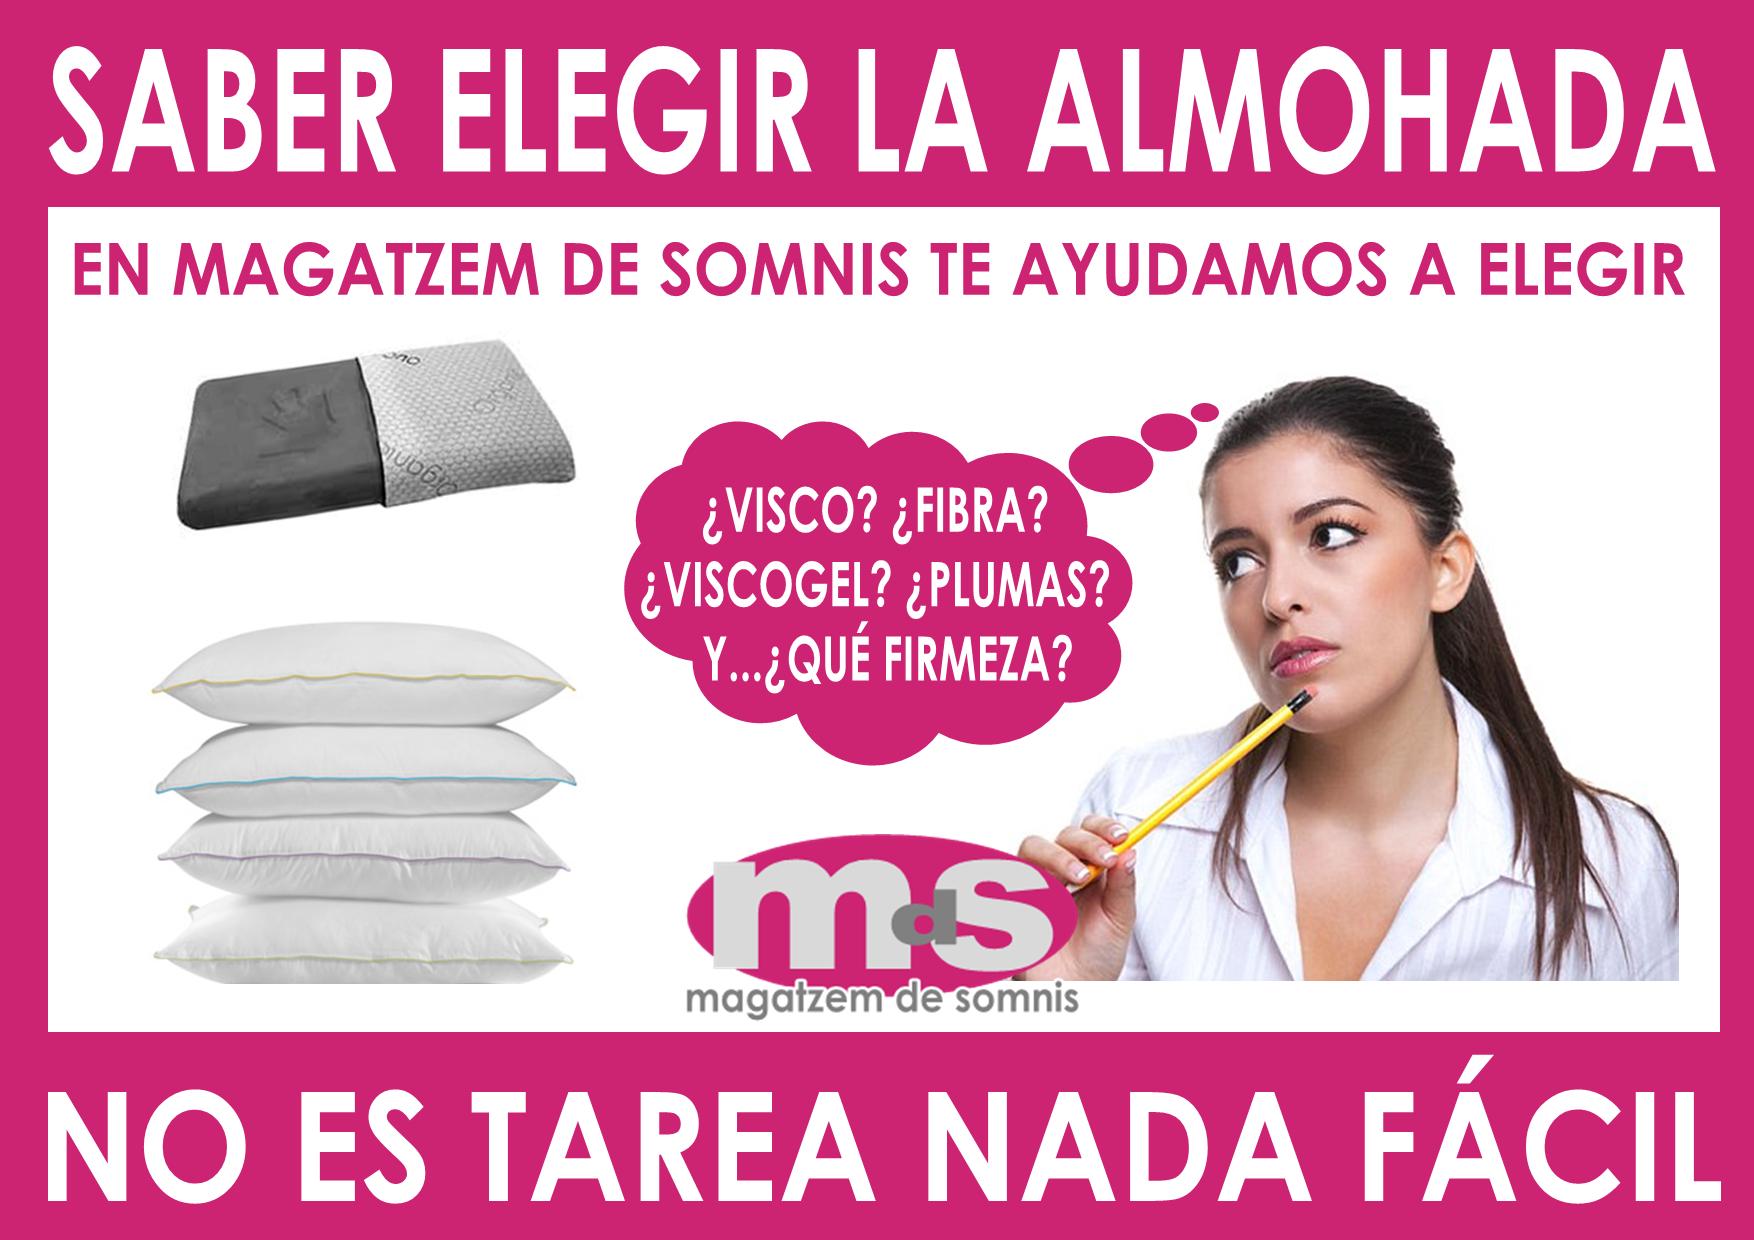 #almohadas #magatzemdesomnis #almacendesuenos